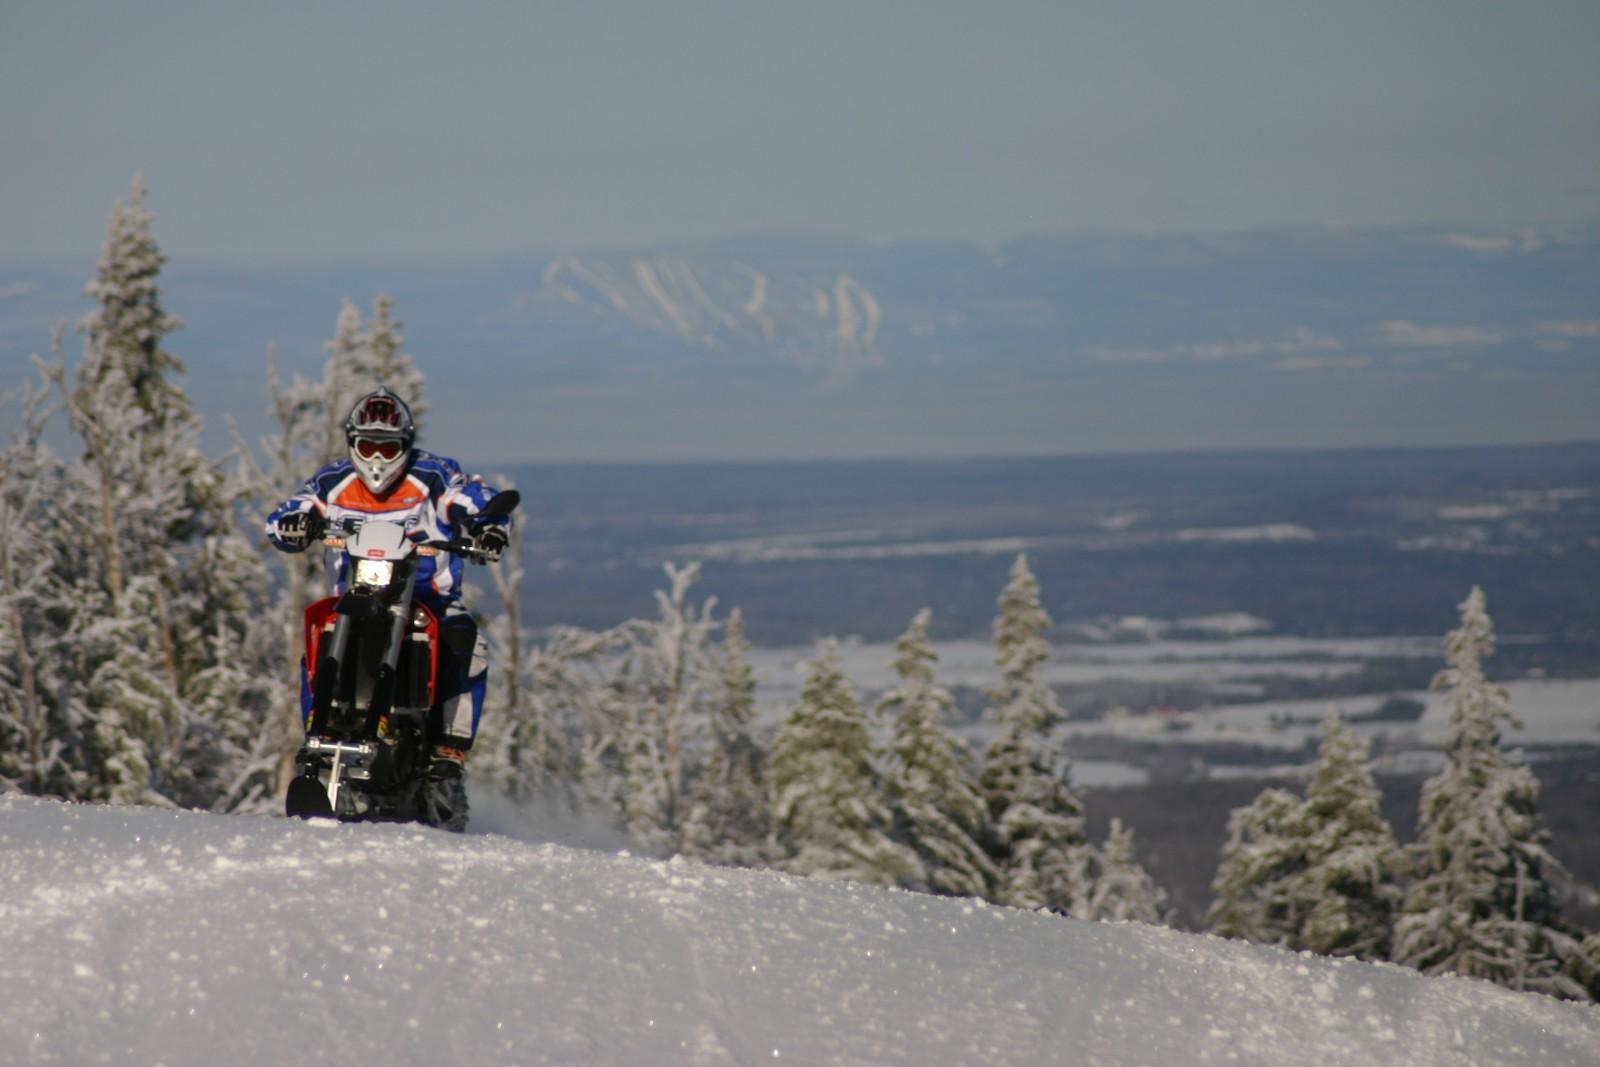 Explorer-snowbike-track-system-for-dirt-bike-supermoto-enduro-mx-AD-Boivin-92-1600x1067